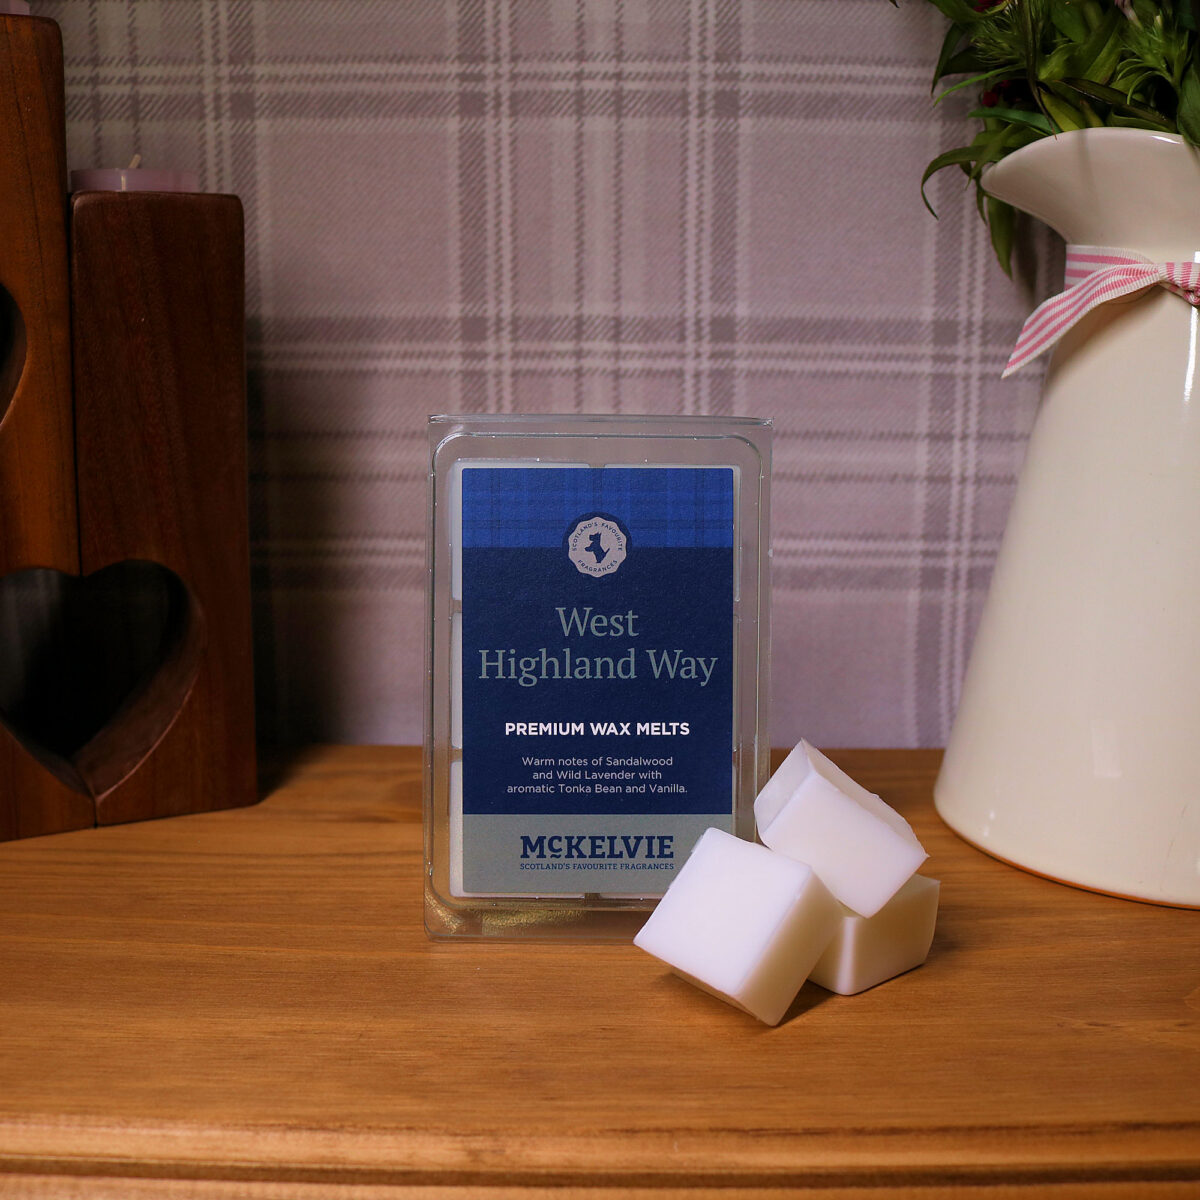 West Highland Way Wax Melts